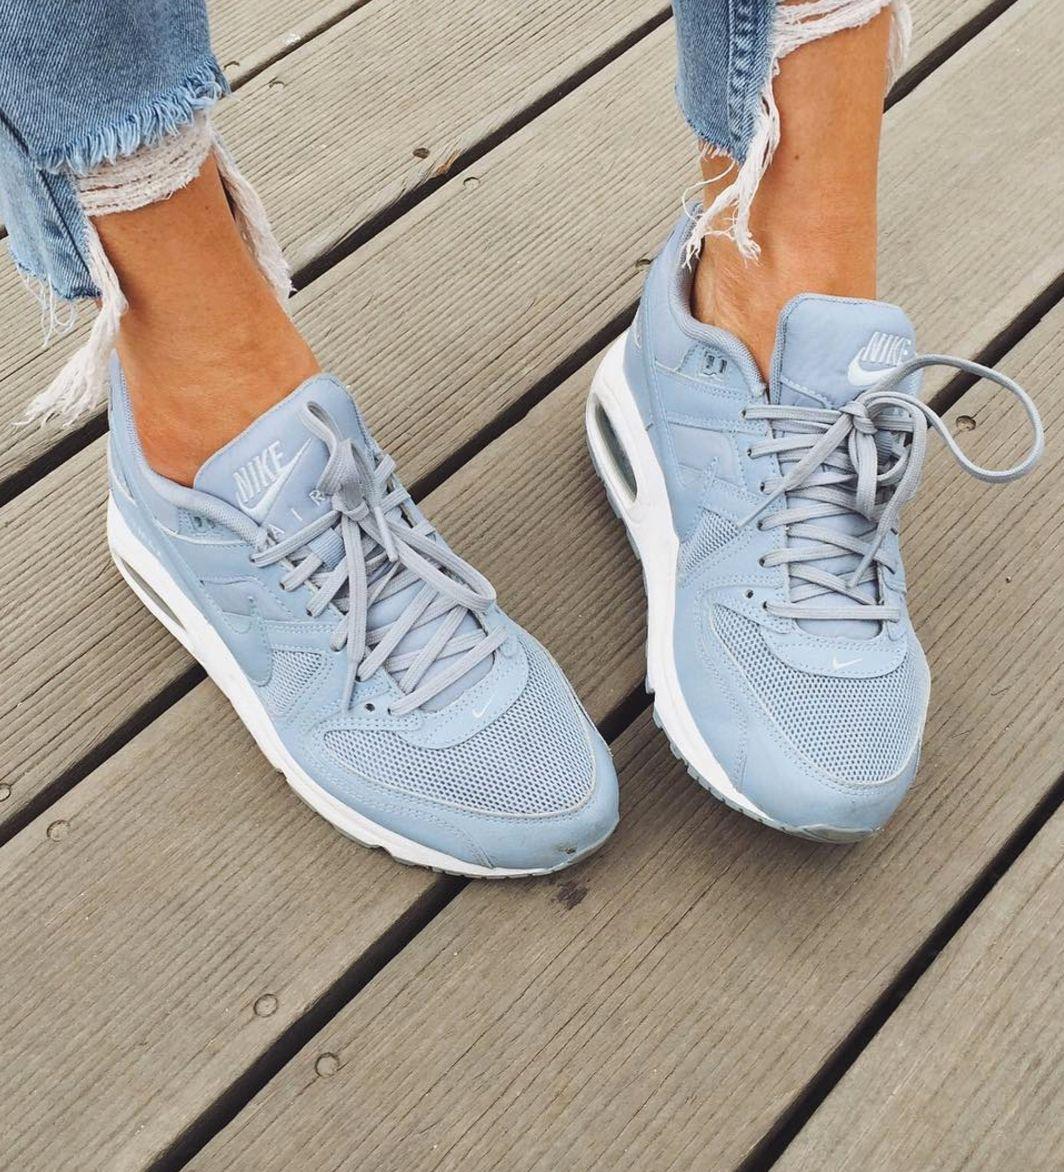 pinterest// sydharrisx ☆ perriwinkle blue nike trainers